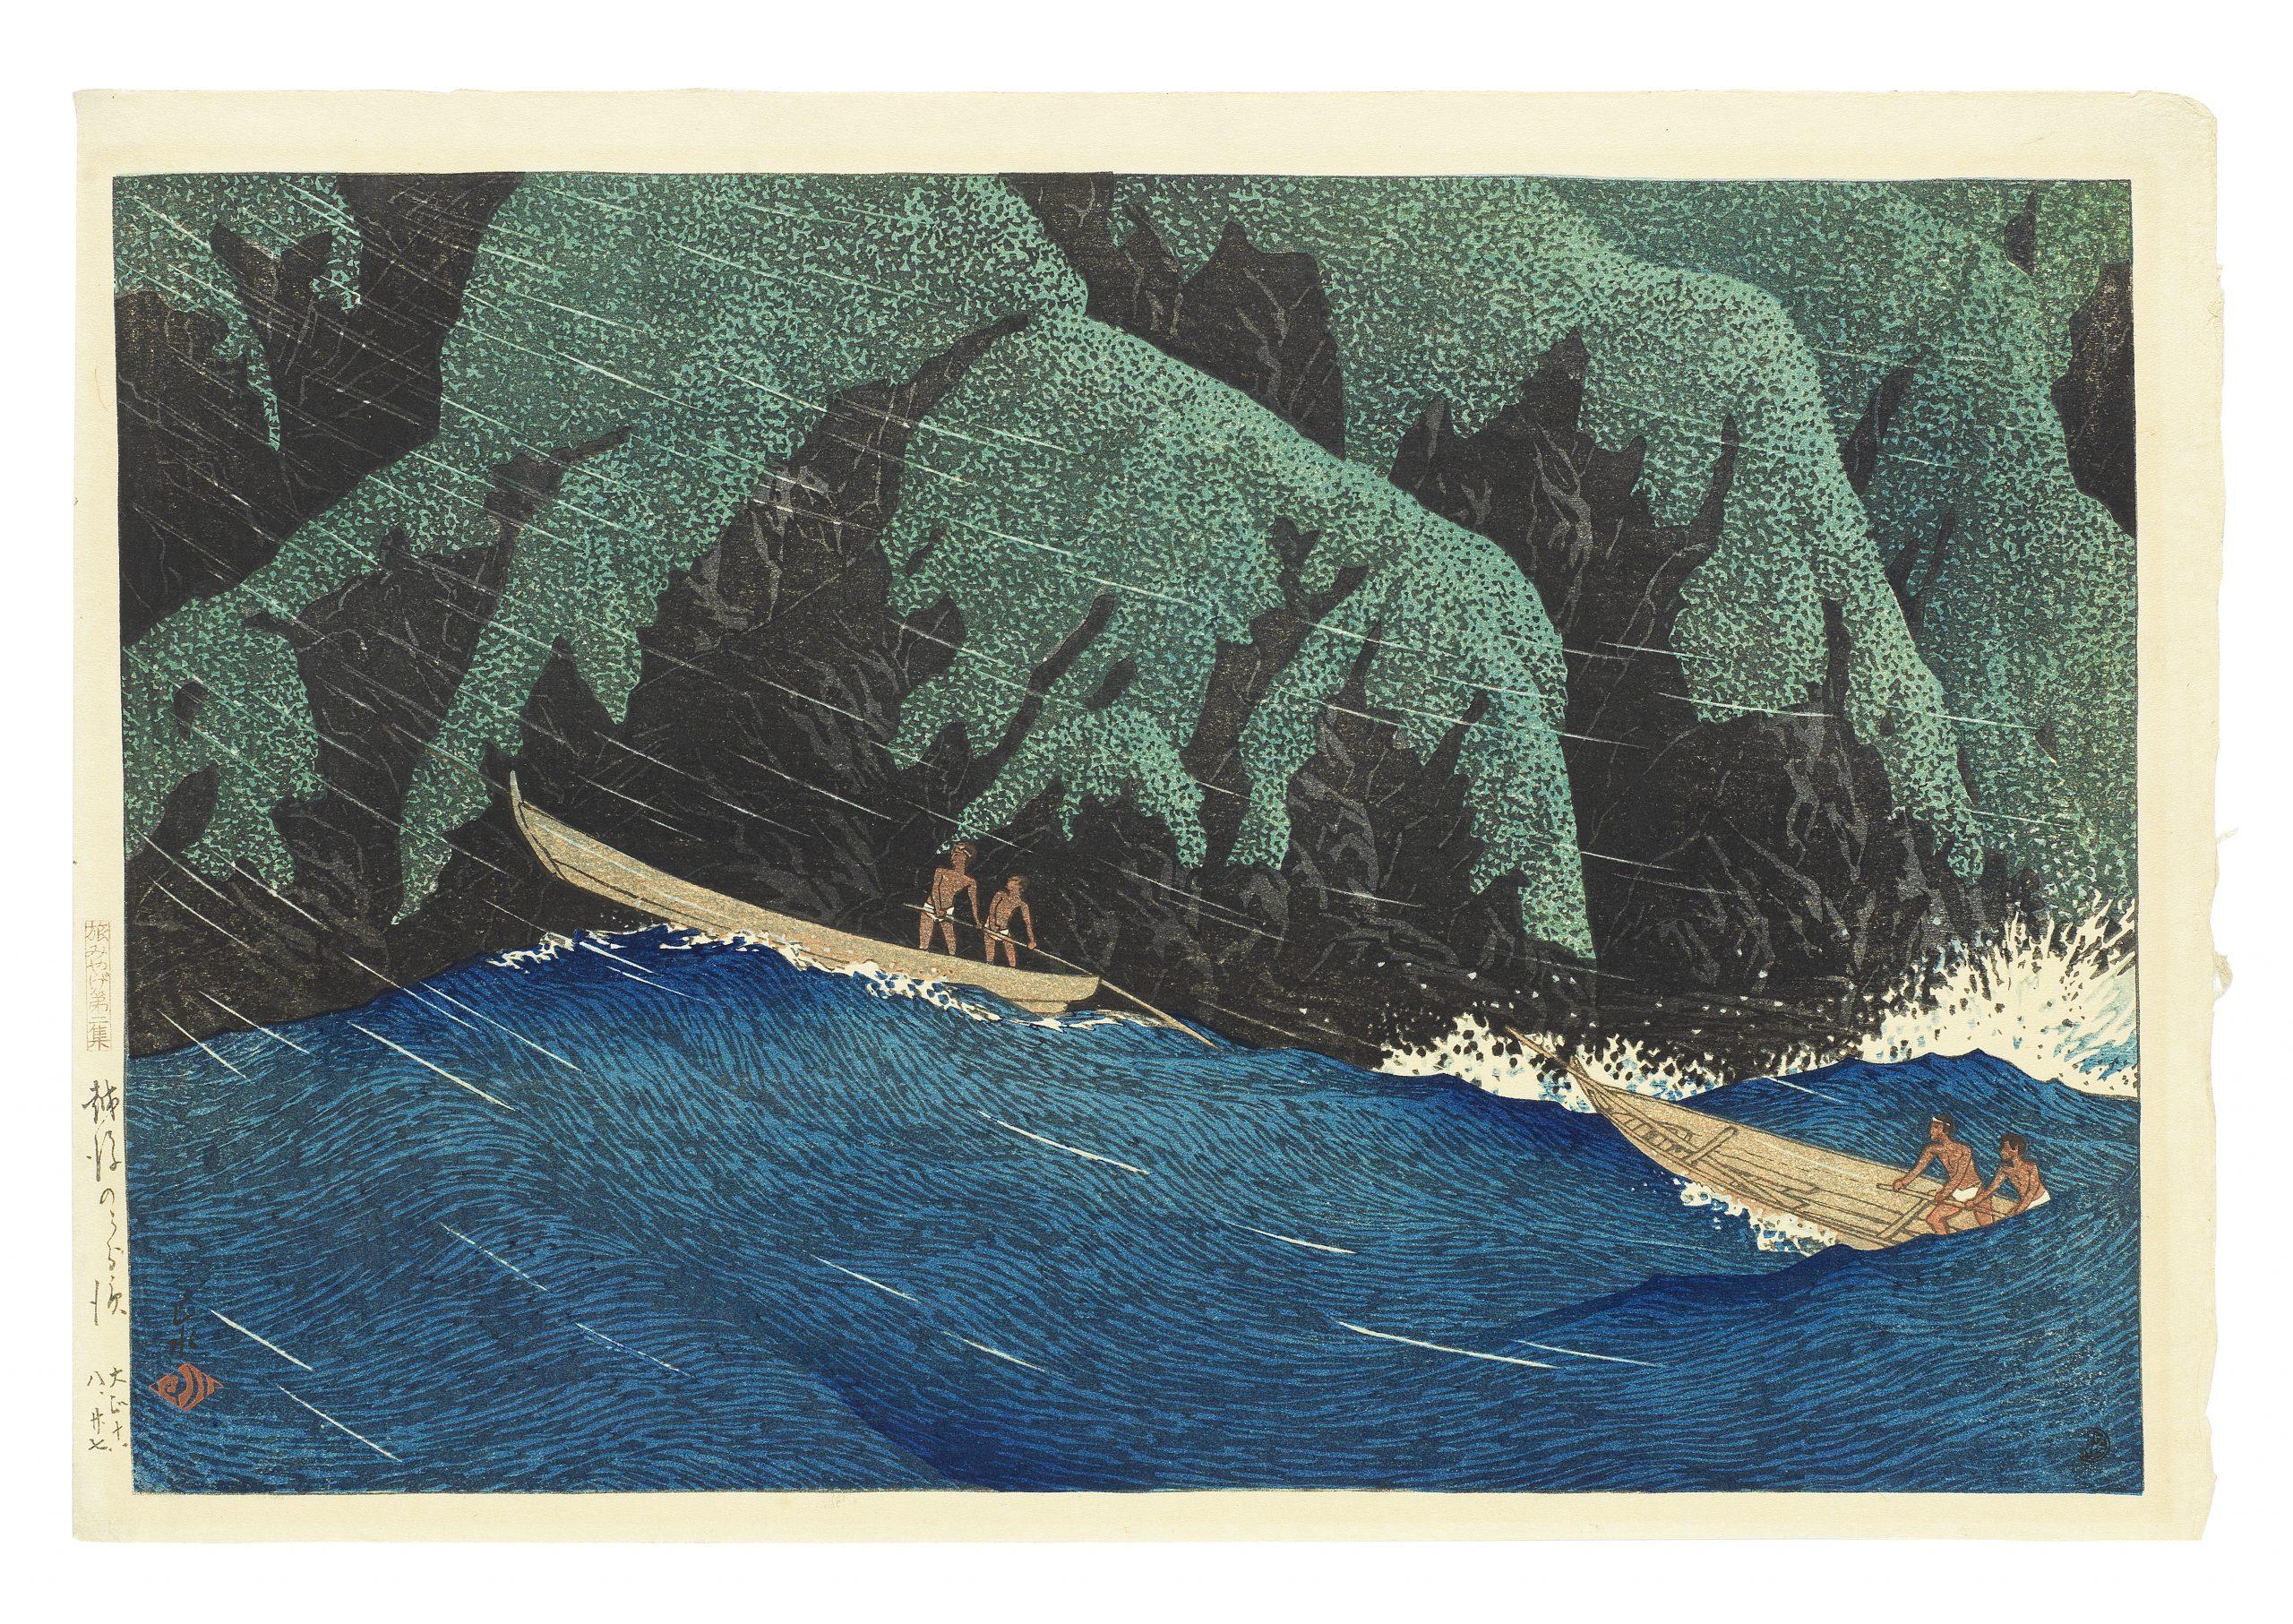 An oban yoko-e print, the series title Tabi miyage dai nishu (Souvenirs of Travel, Second Series) followed by the title Urahama no Echigo (Urahama in Echigo), Kawase Hasui (1883-1957) Taisho era (1912-1926), dated 1921 - Snow, Sex and Spectacle